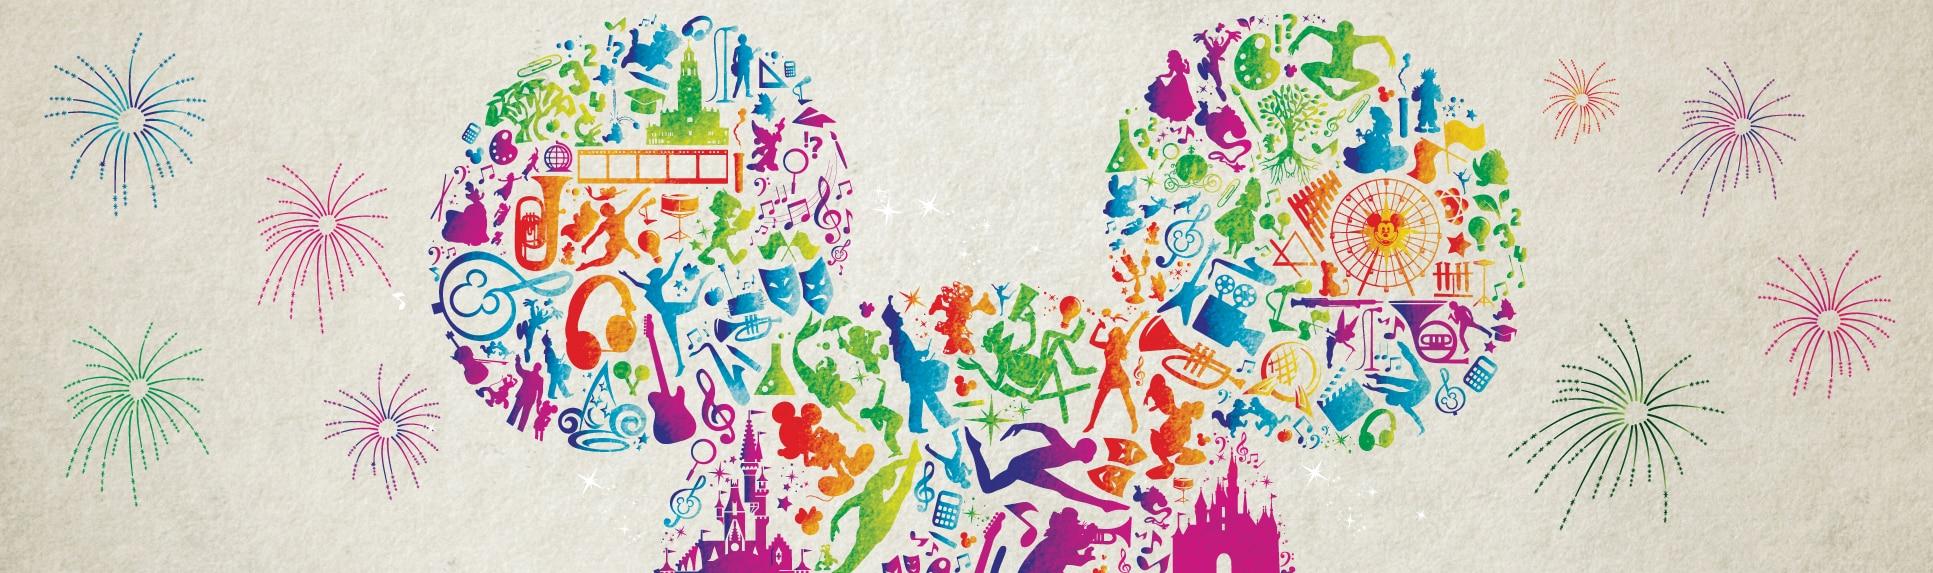 Disney Youth Programs Blog